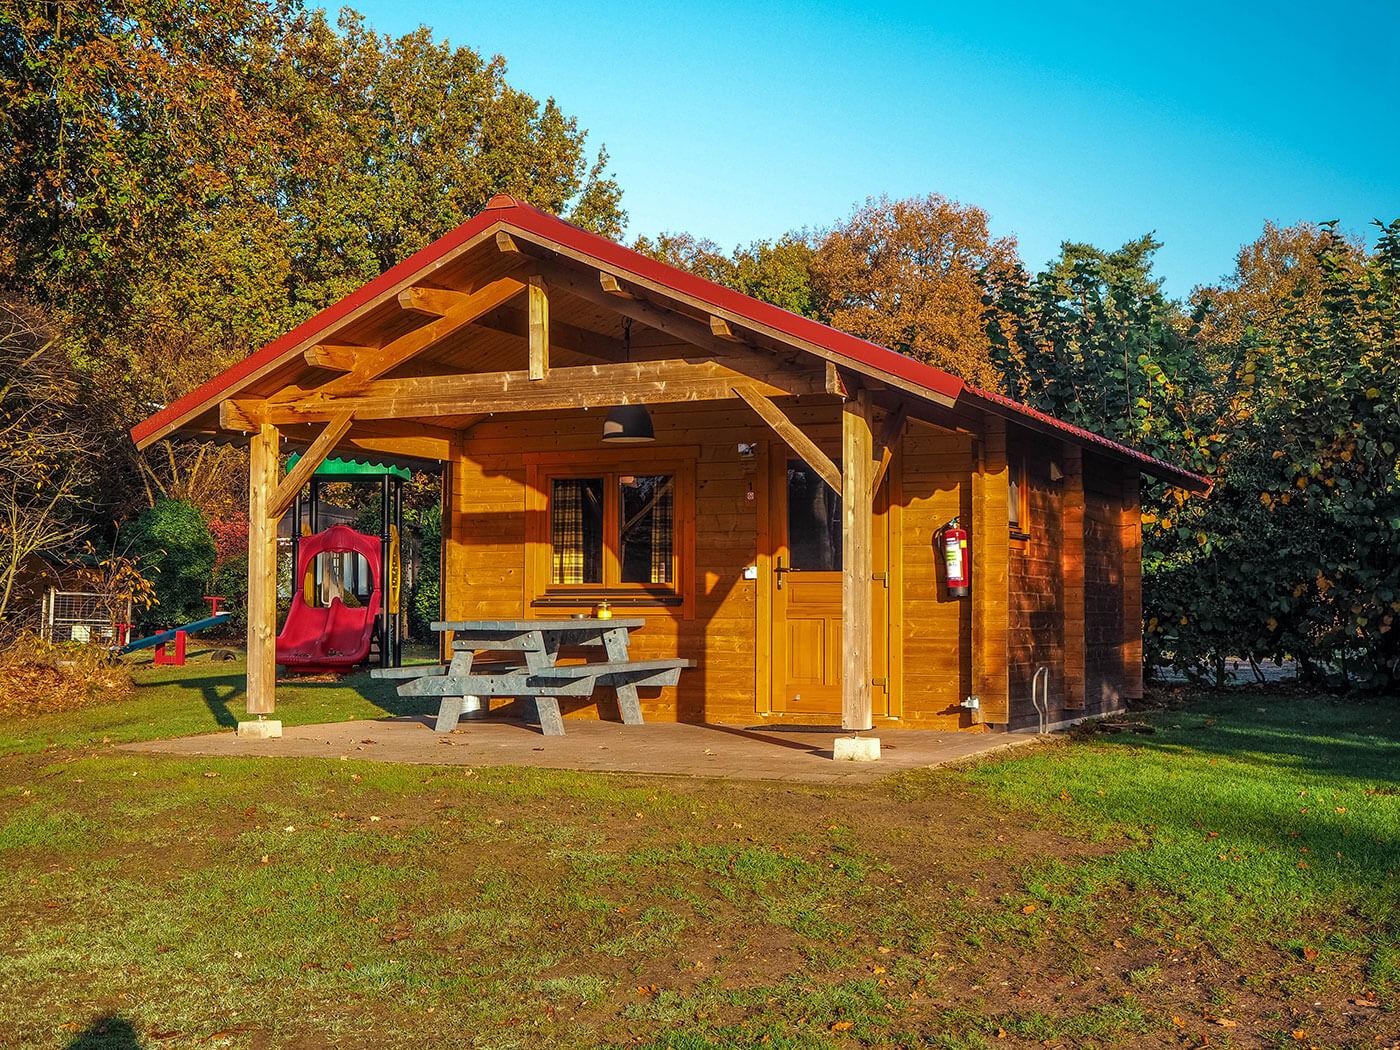 houten trekkershut comfort blokhut op camping holterberg